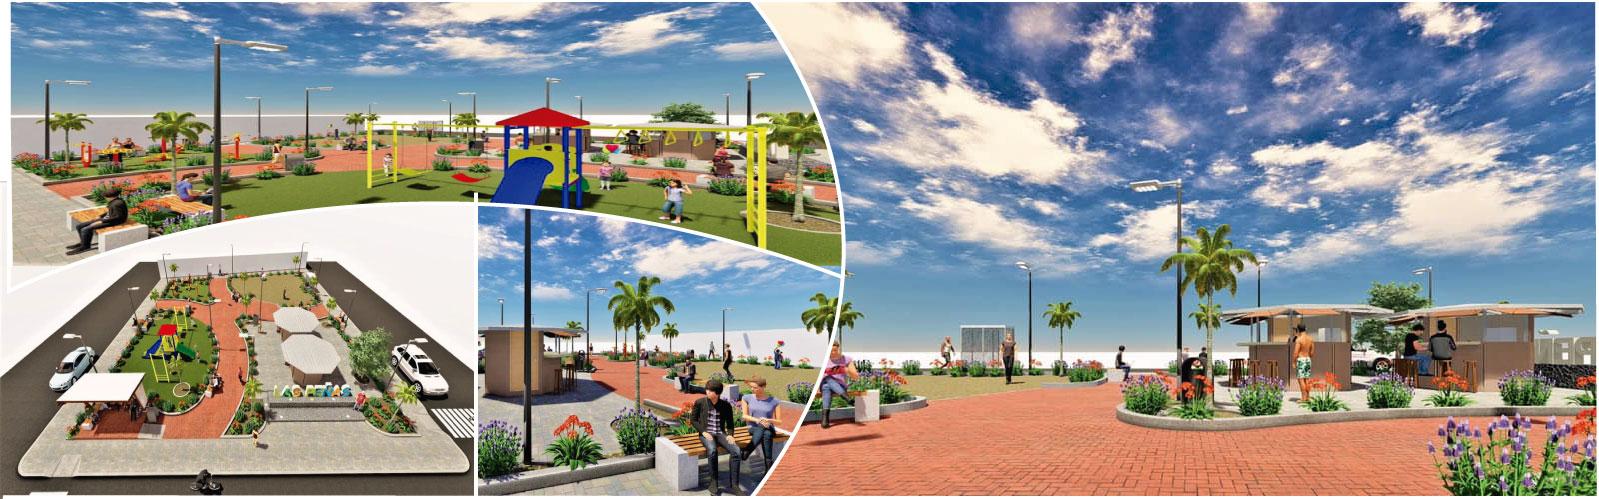 2021proyecto-parque.jpg